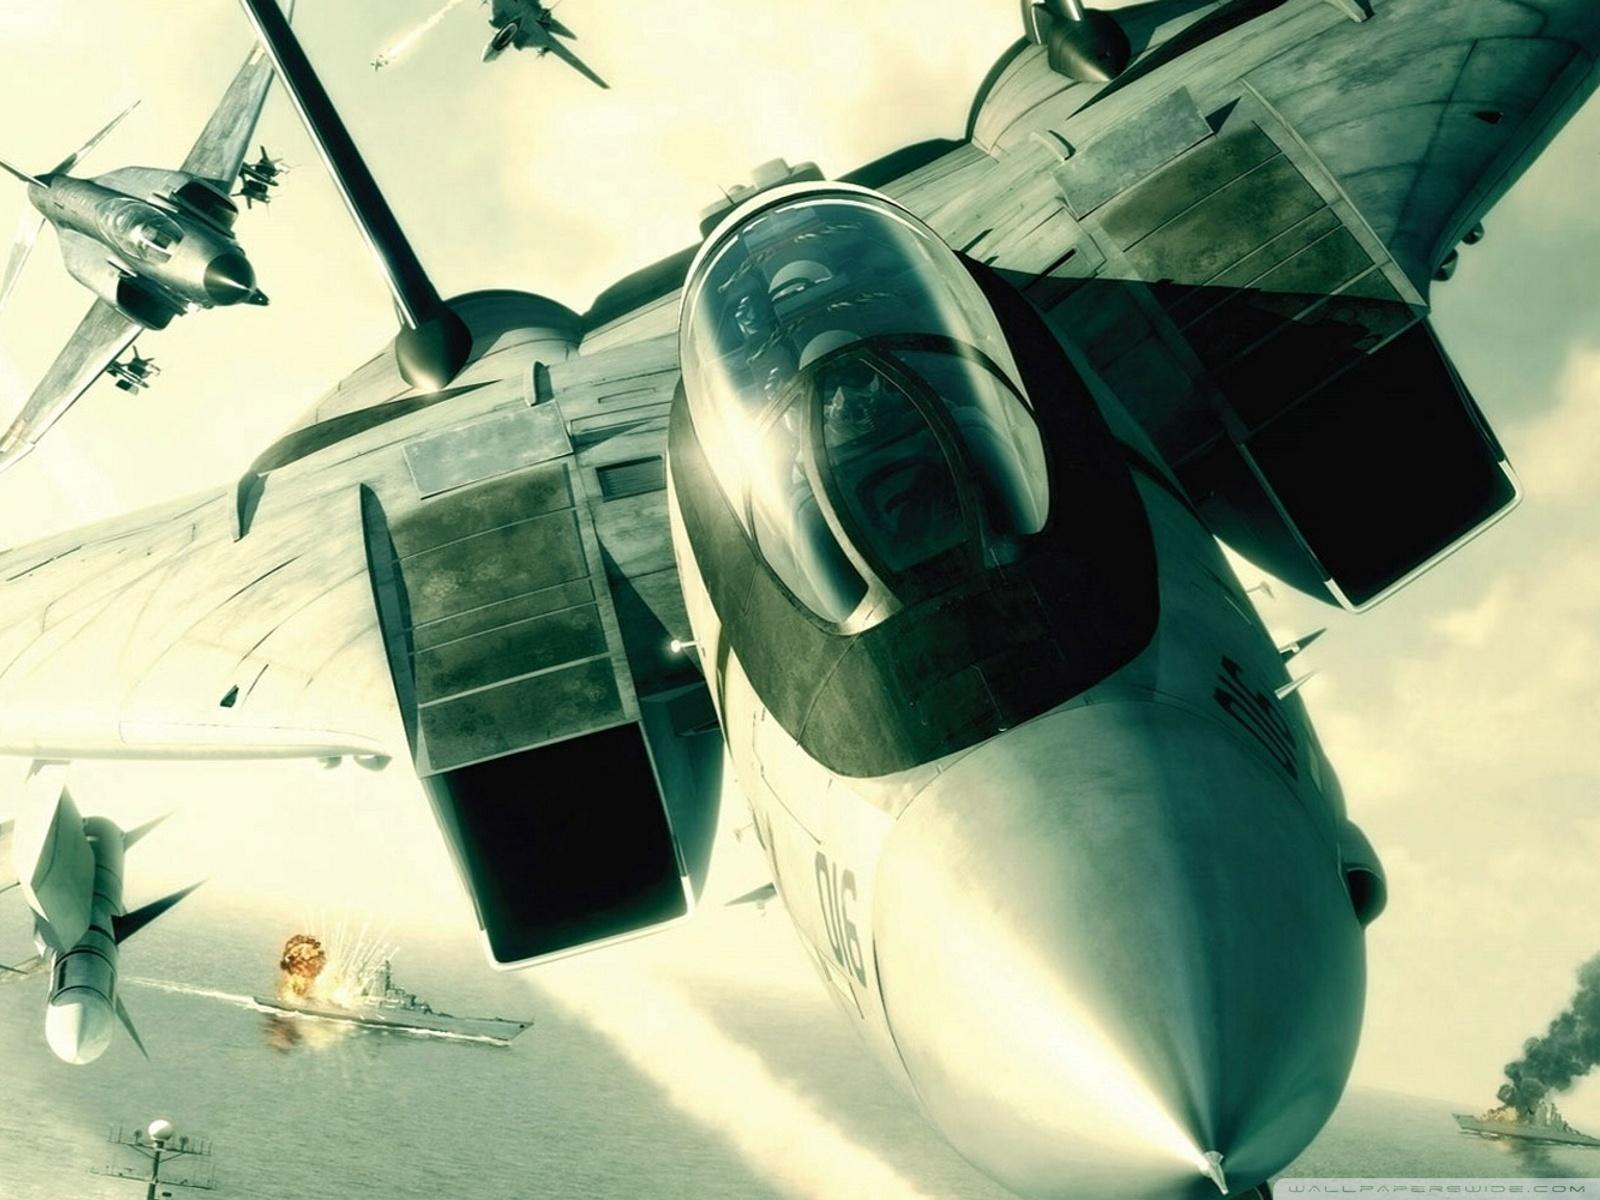 Ace Combat HD wallpaper 1600x1200   Fondo hd 1764 1600x1200